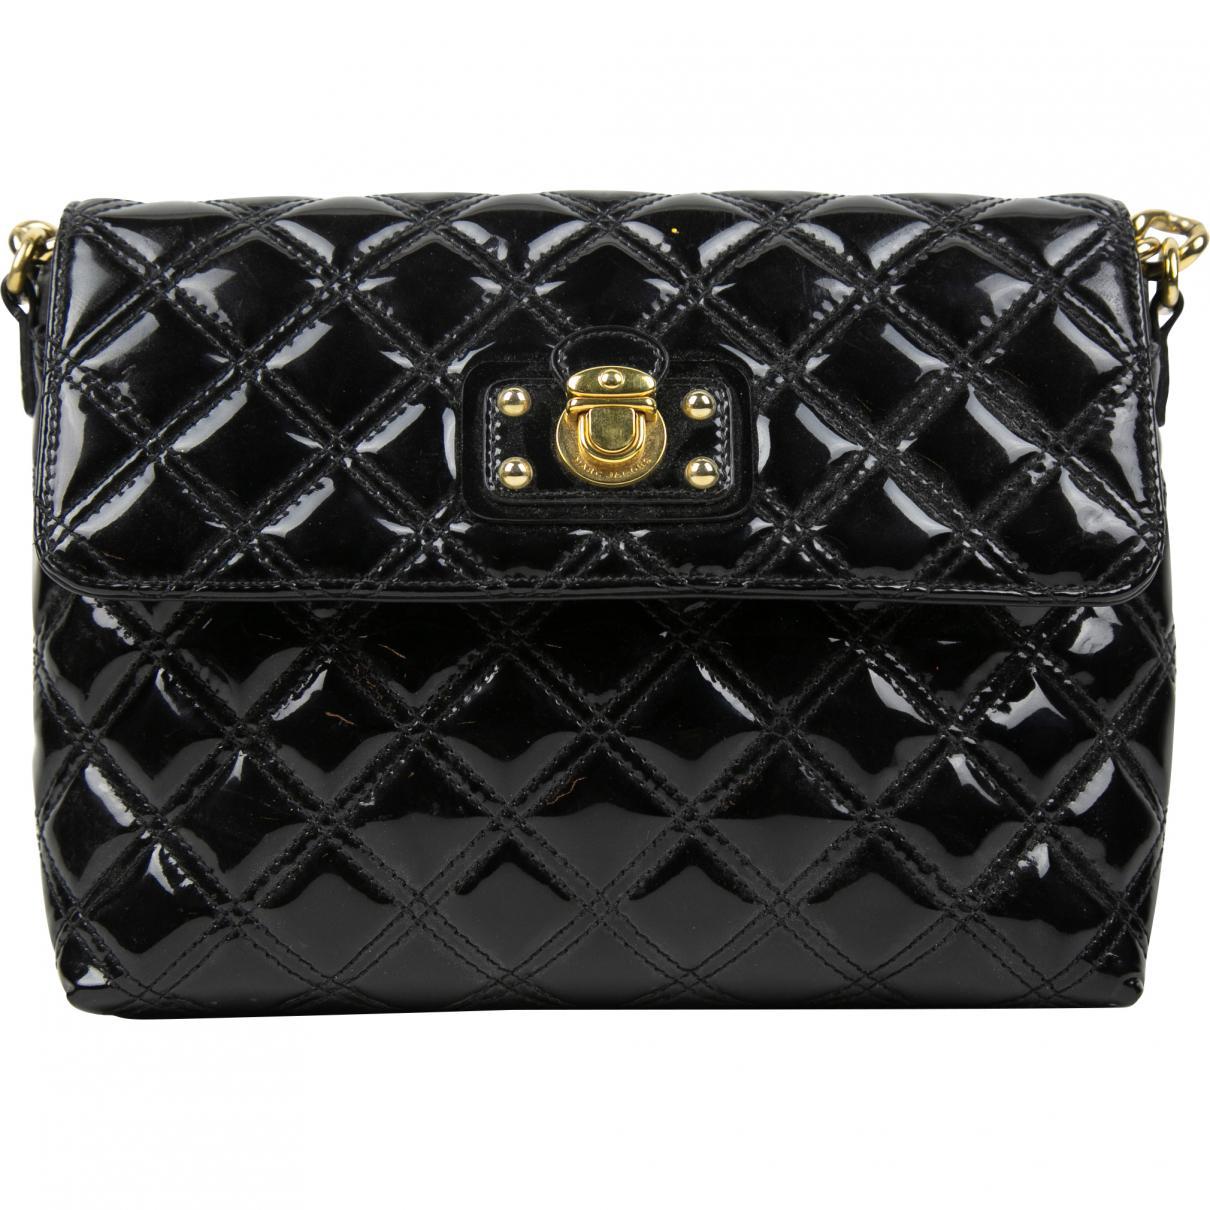 Pre-owned - Single patent leather handbag Marc Jacobs KFLf6